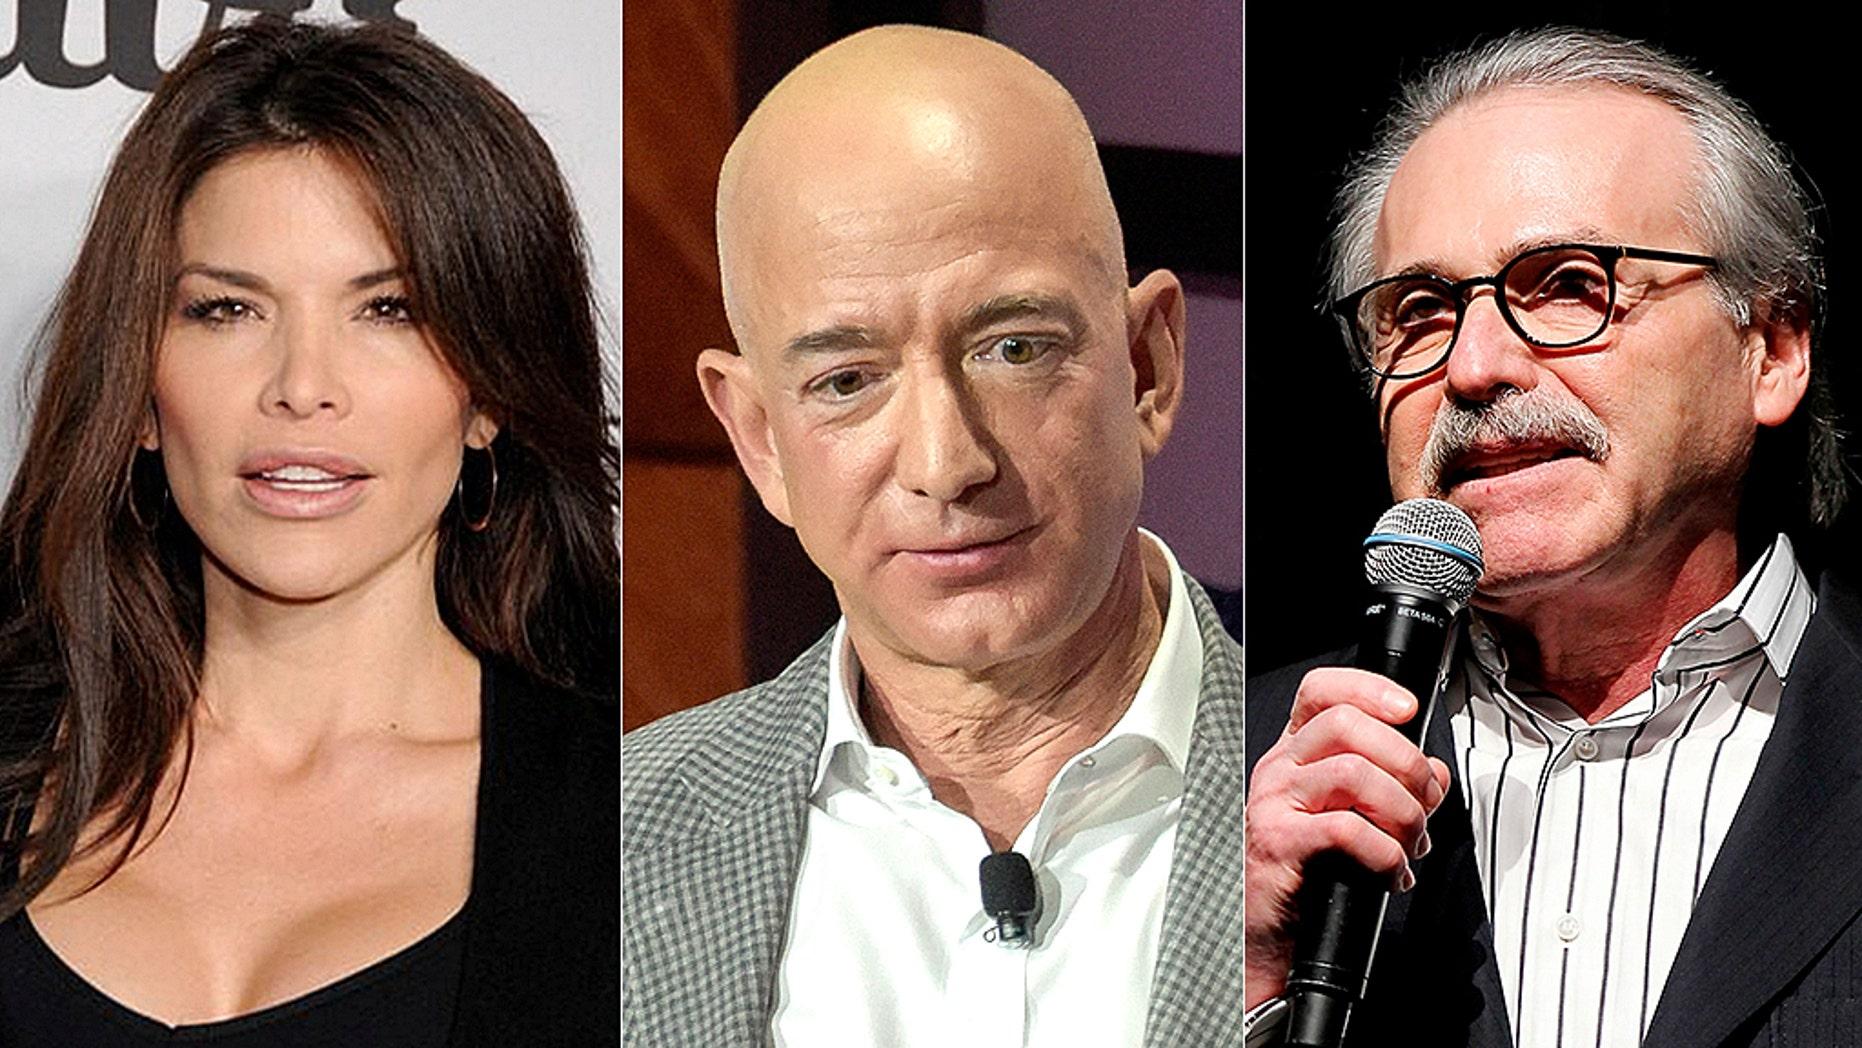 Lauren Sanchez, Jeff Bezos and American Media CEO David Pecker, the publisher of National Enquirer.